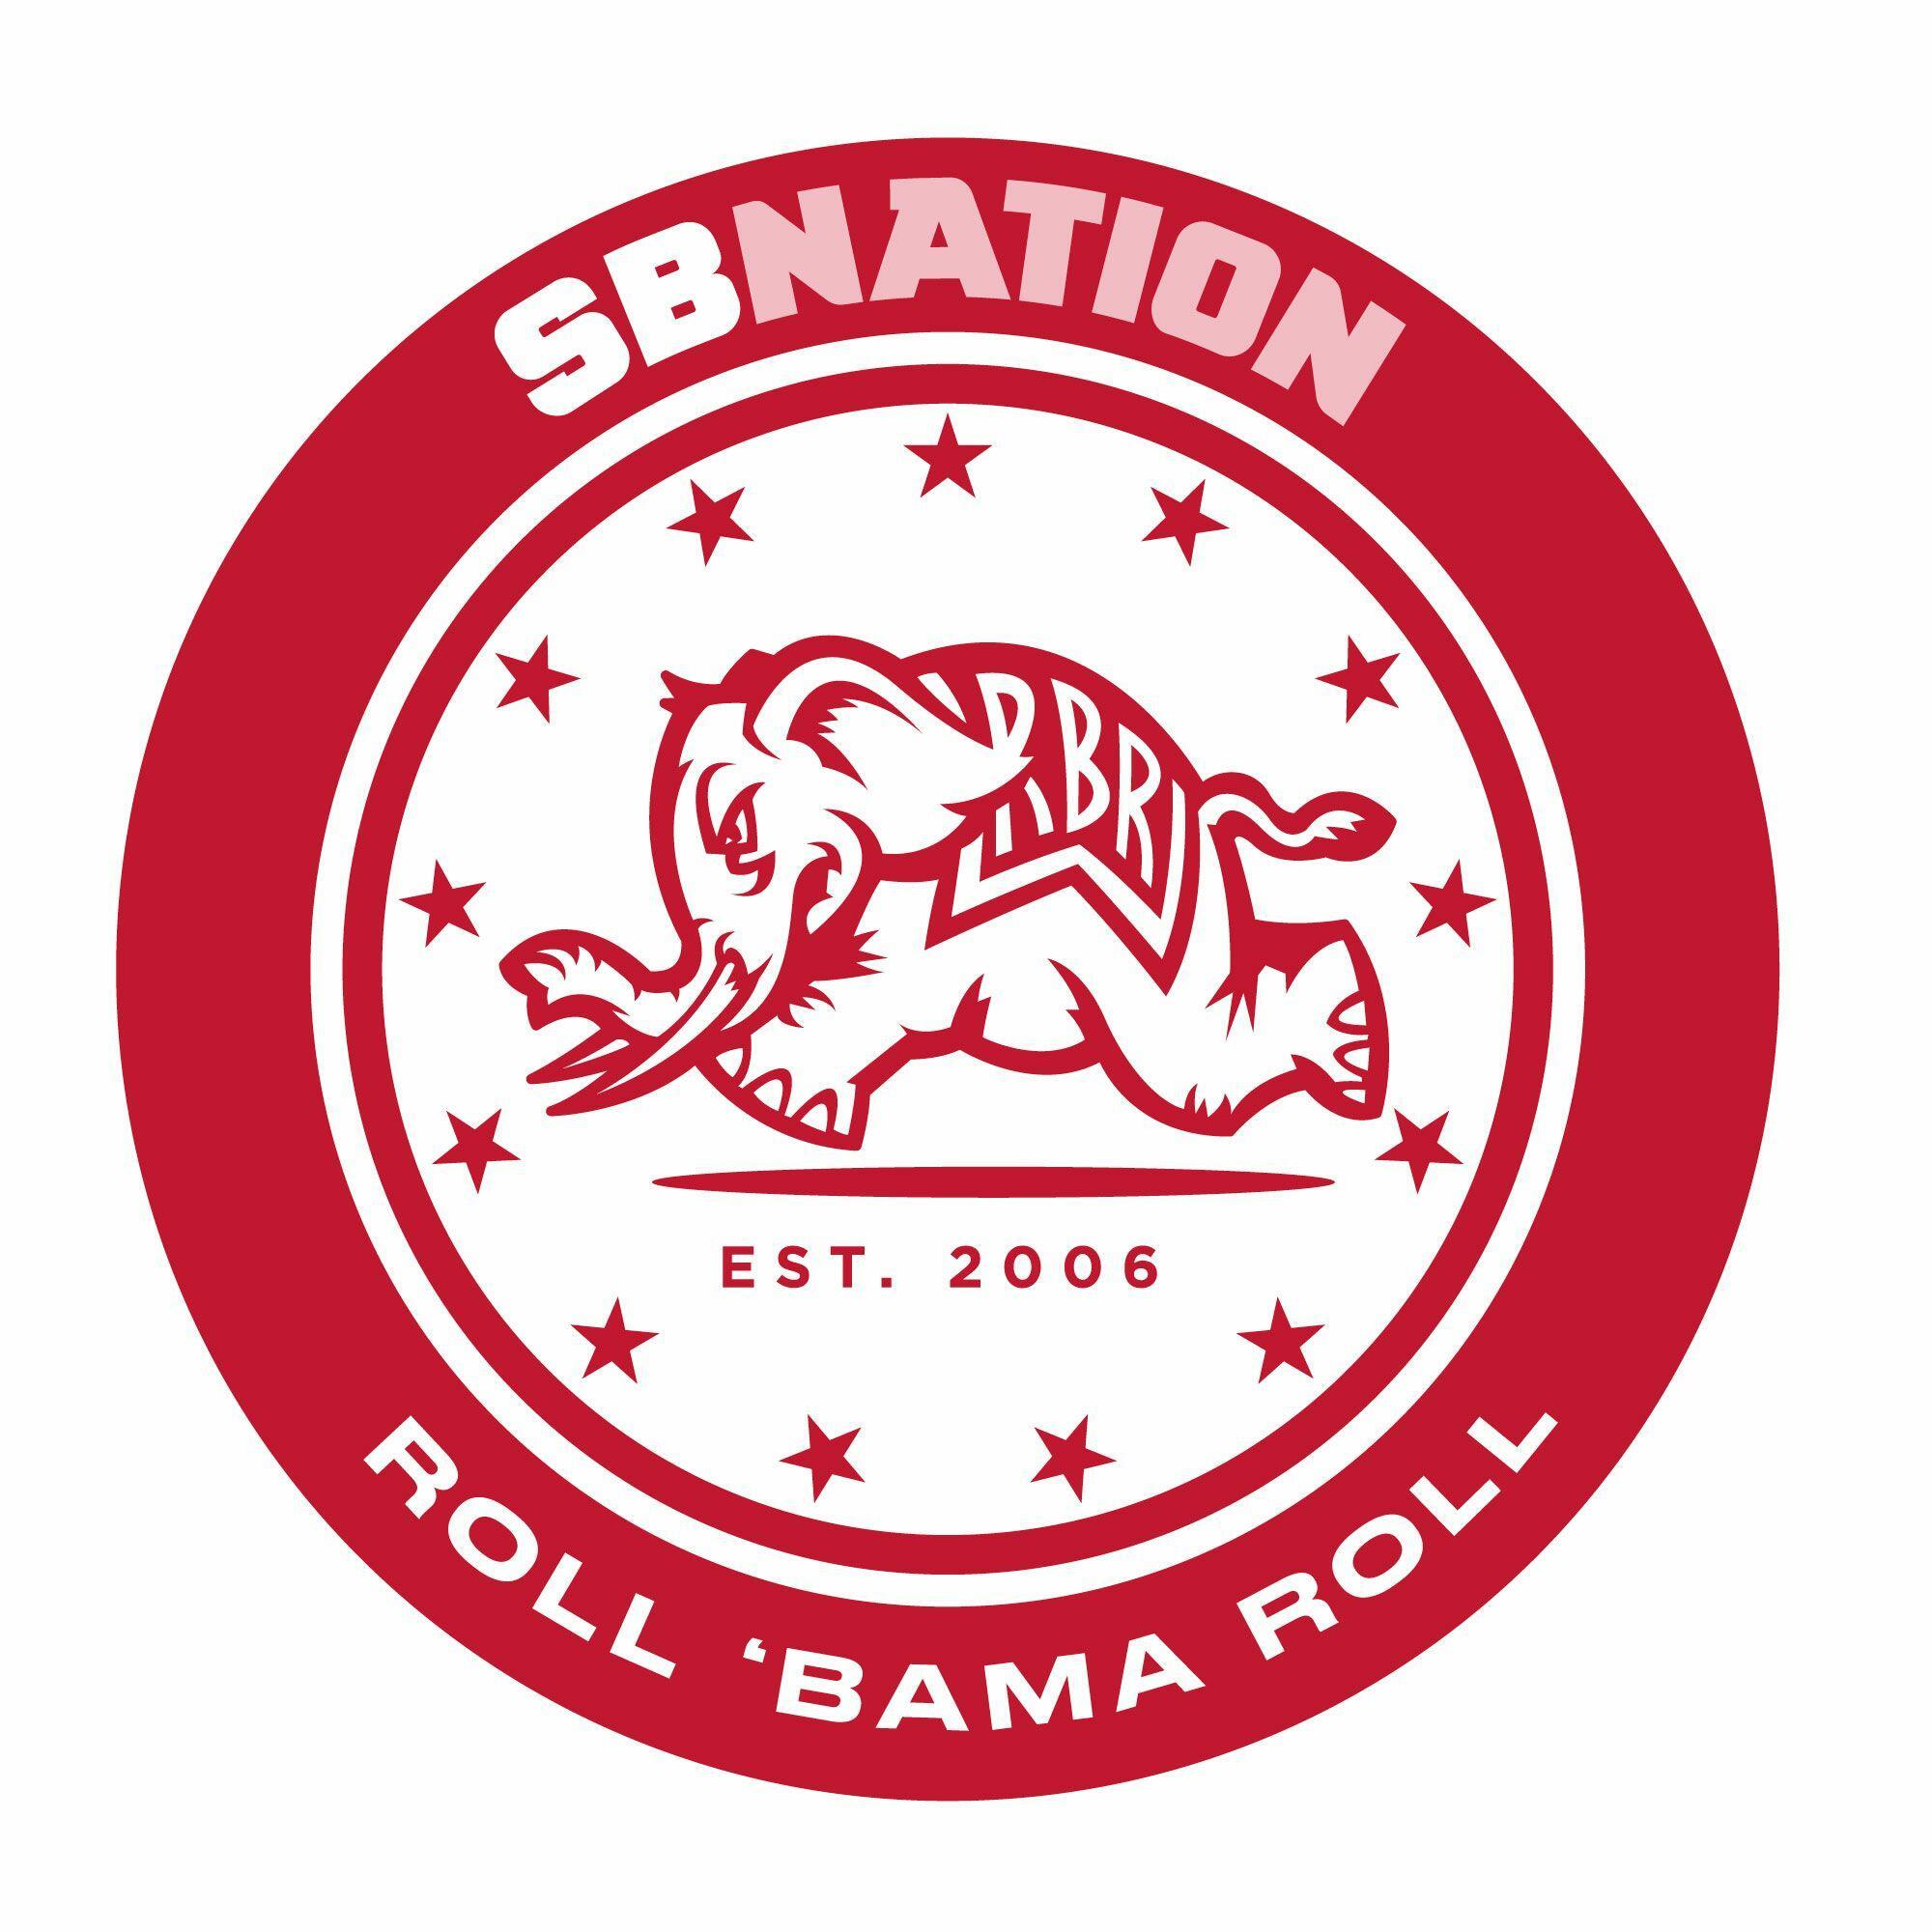 Roll Bama Roll: for Alabama Crimson Tide fans